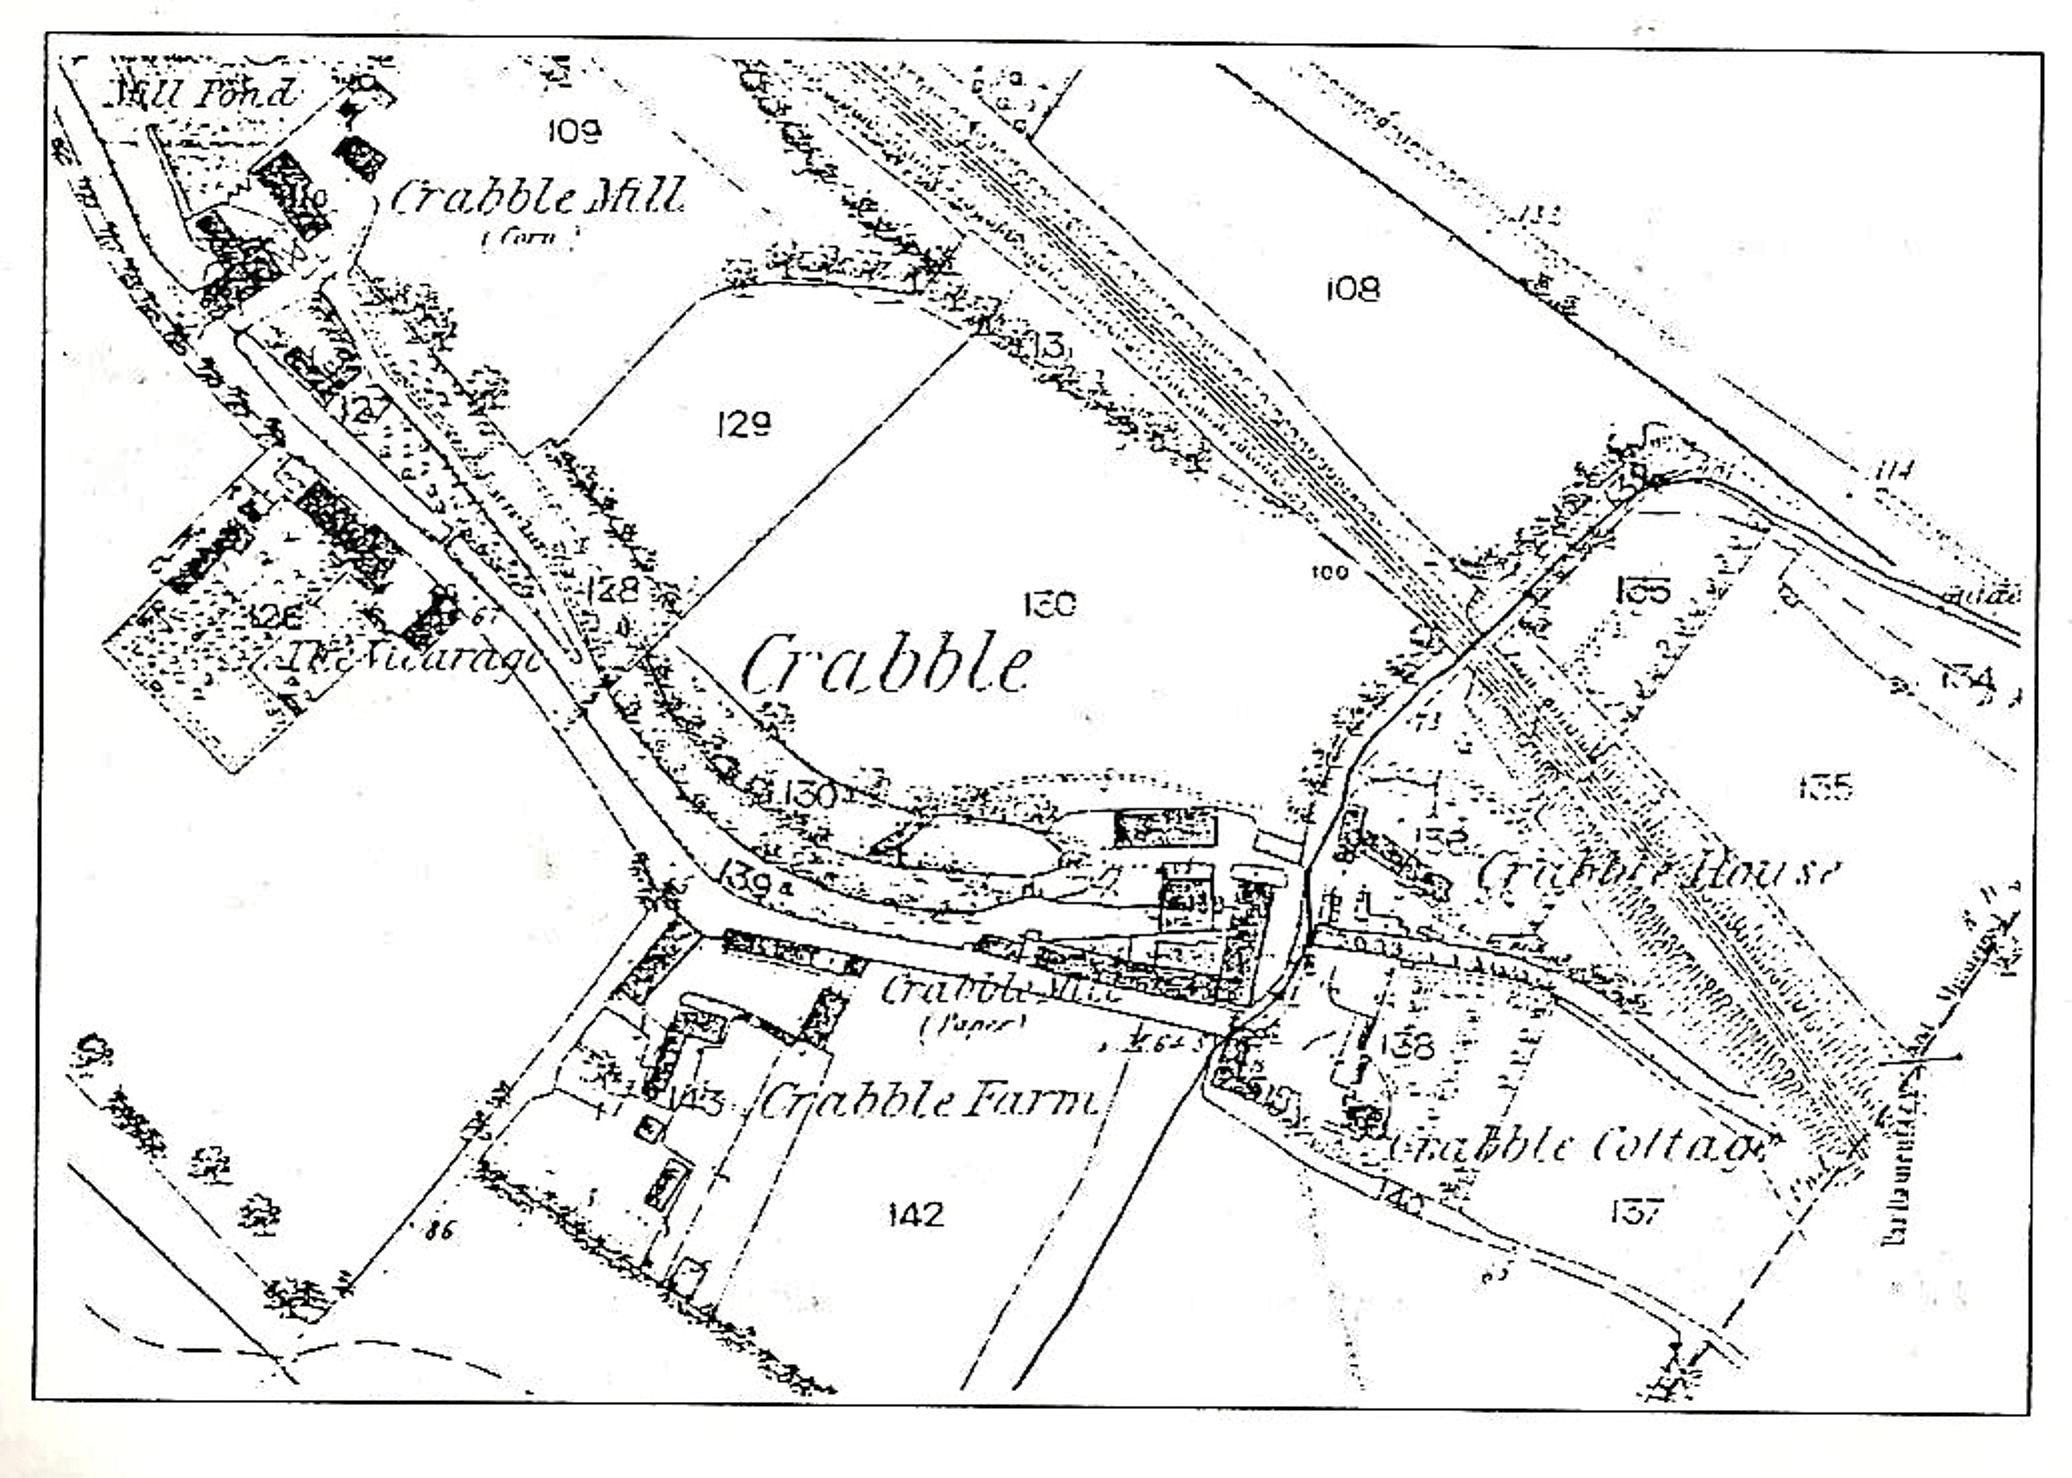 Crabble Tram Accident